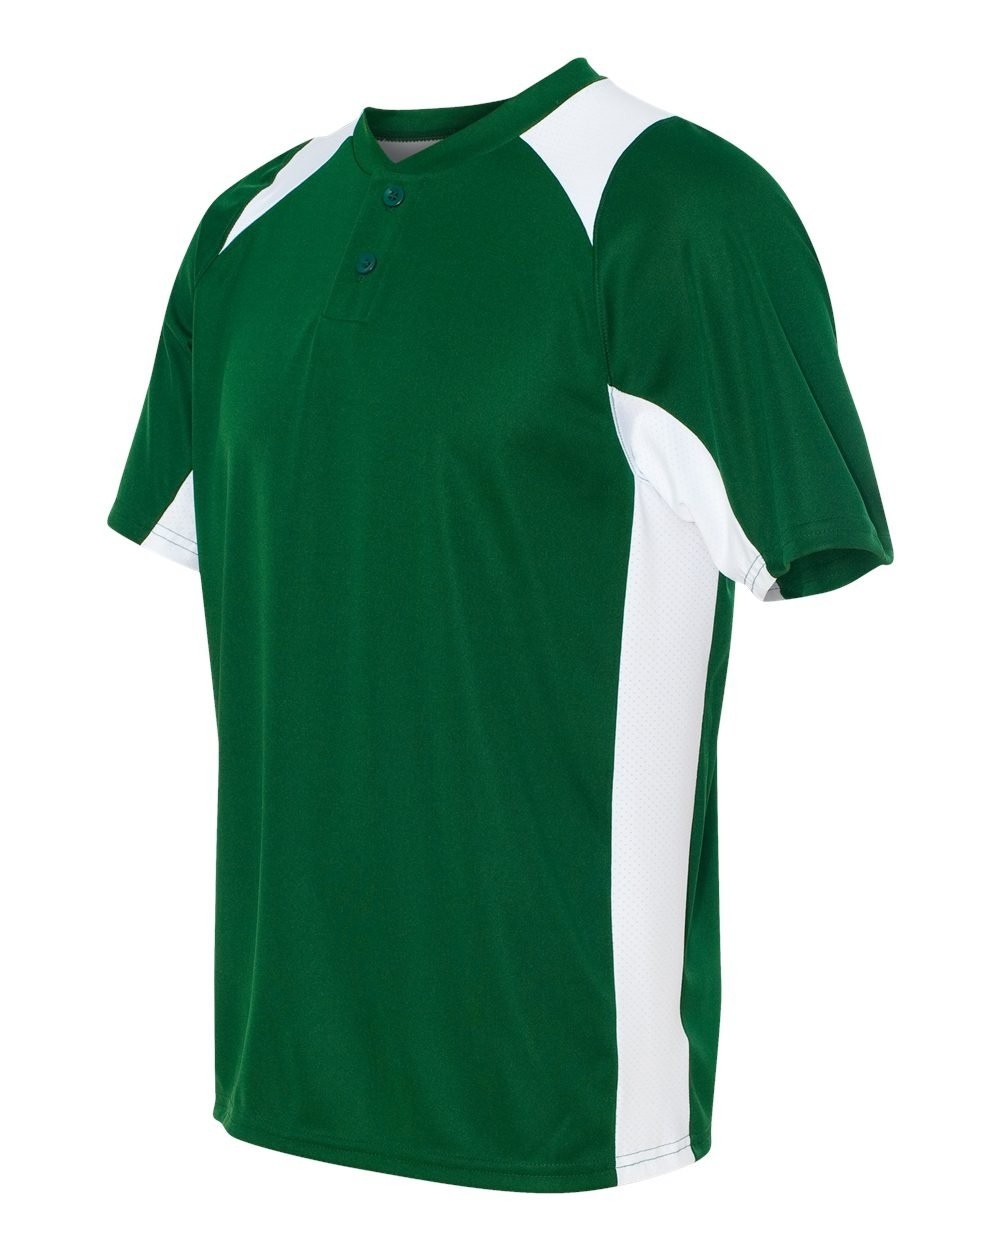 Augusta SportswearメンズGamer野球ジャージー B00DOFRLDM Medium|ダークグリーン/ホワイト ダークグリーン/ホワイト Medium